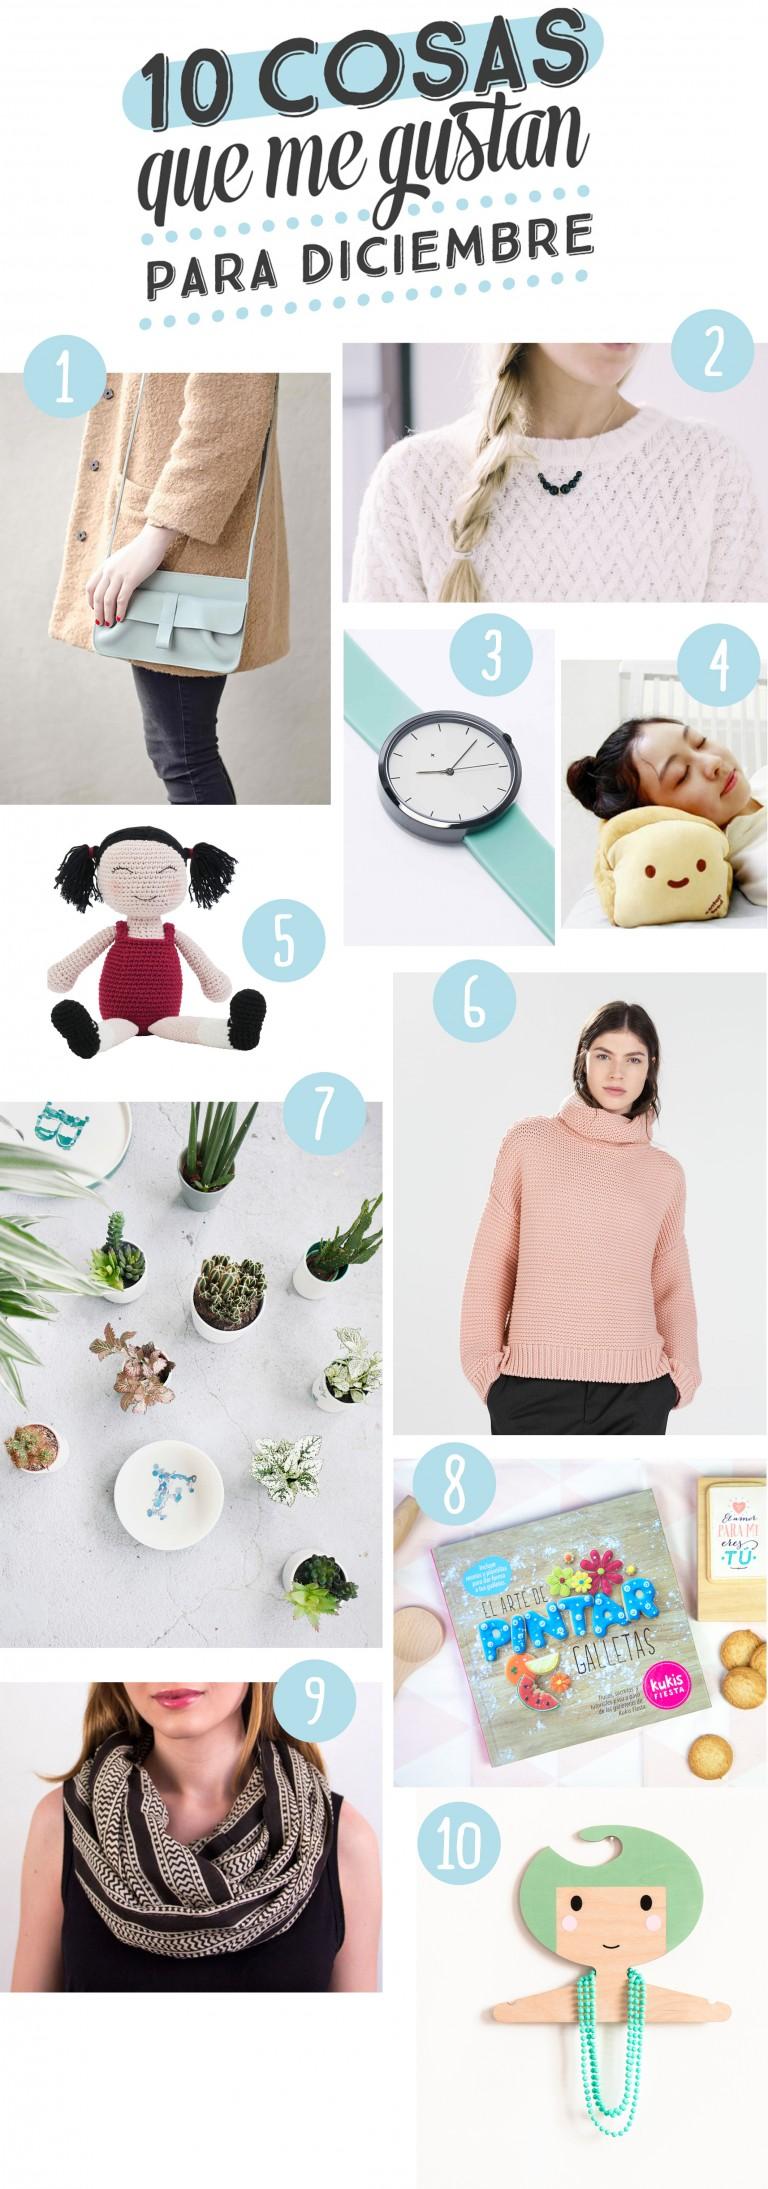 10 cosas que me gustan para diciembre